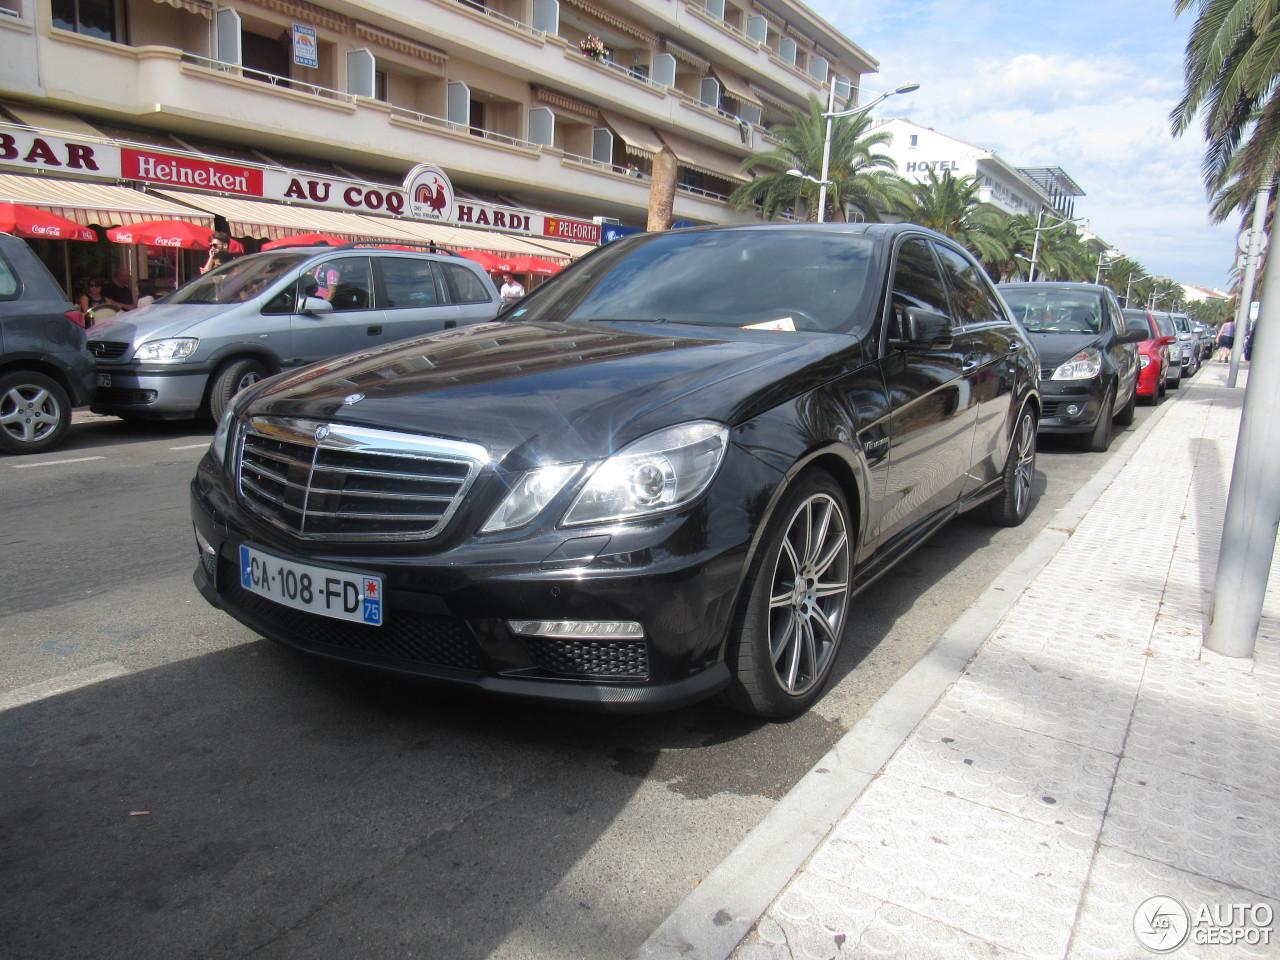 Mercedes benz e 63 amg w212 v8 biturbo 3 march 2016 for Mercedes benz v8 biturbo price